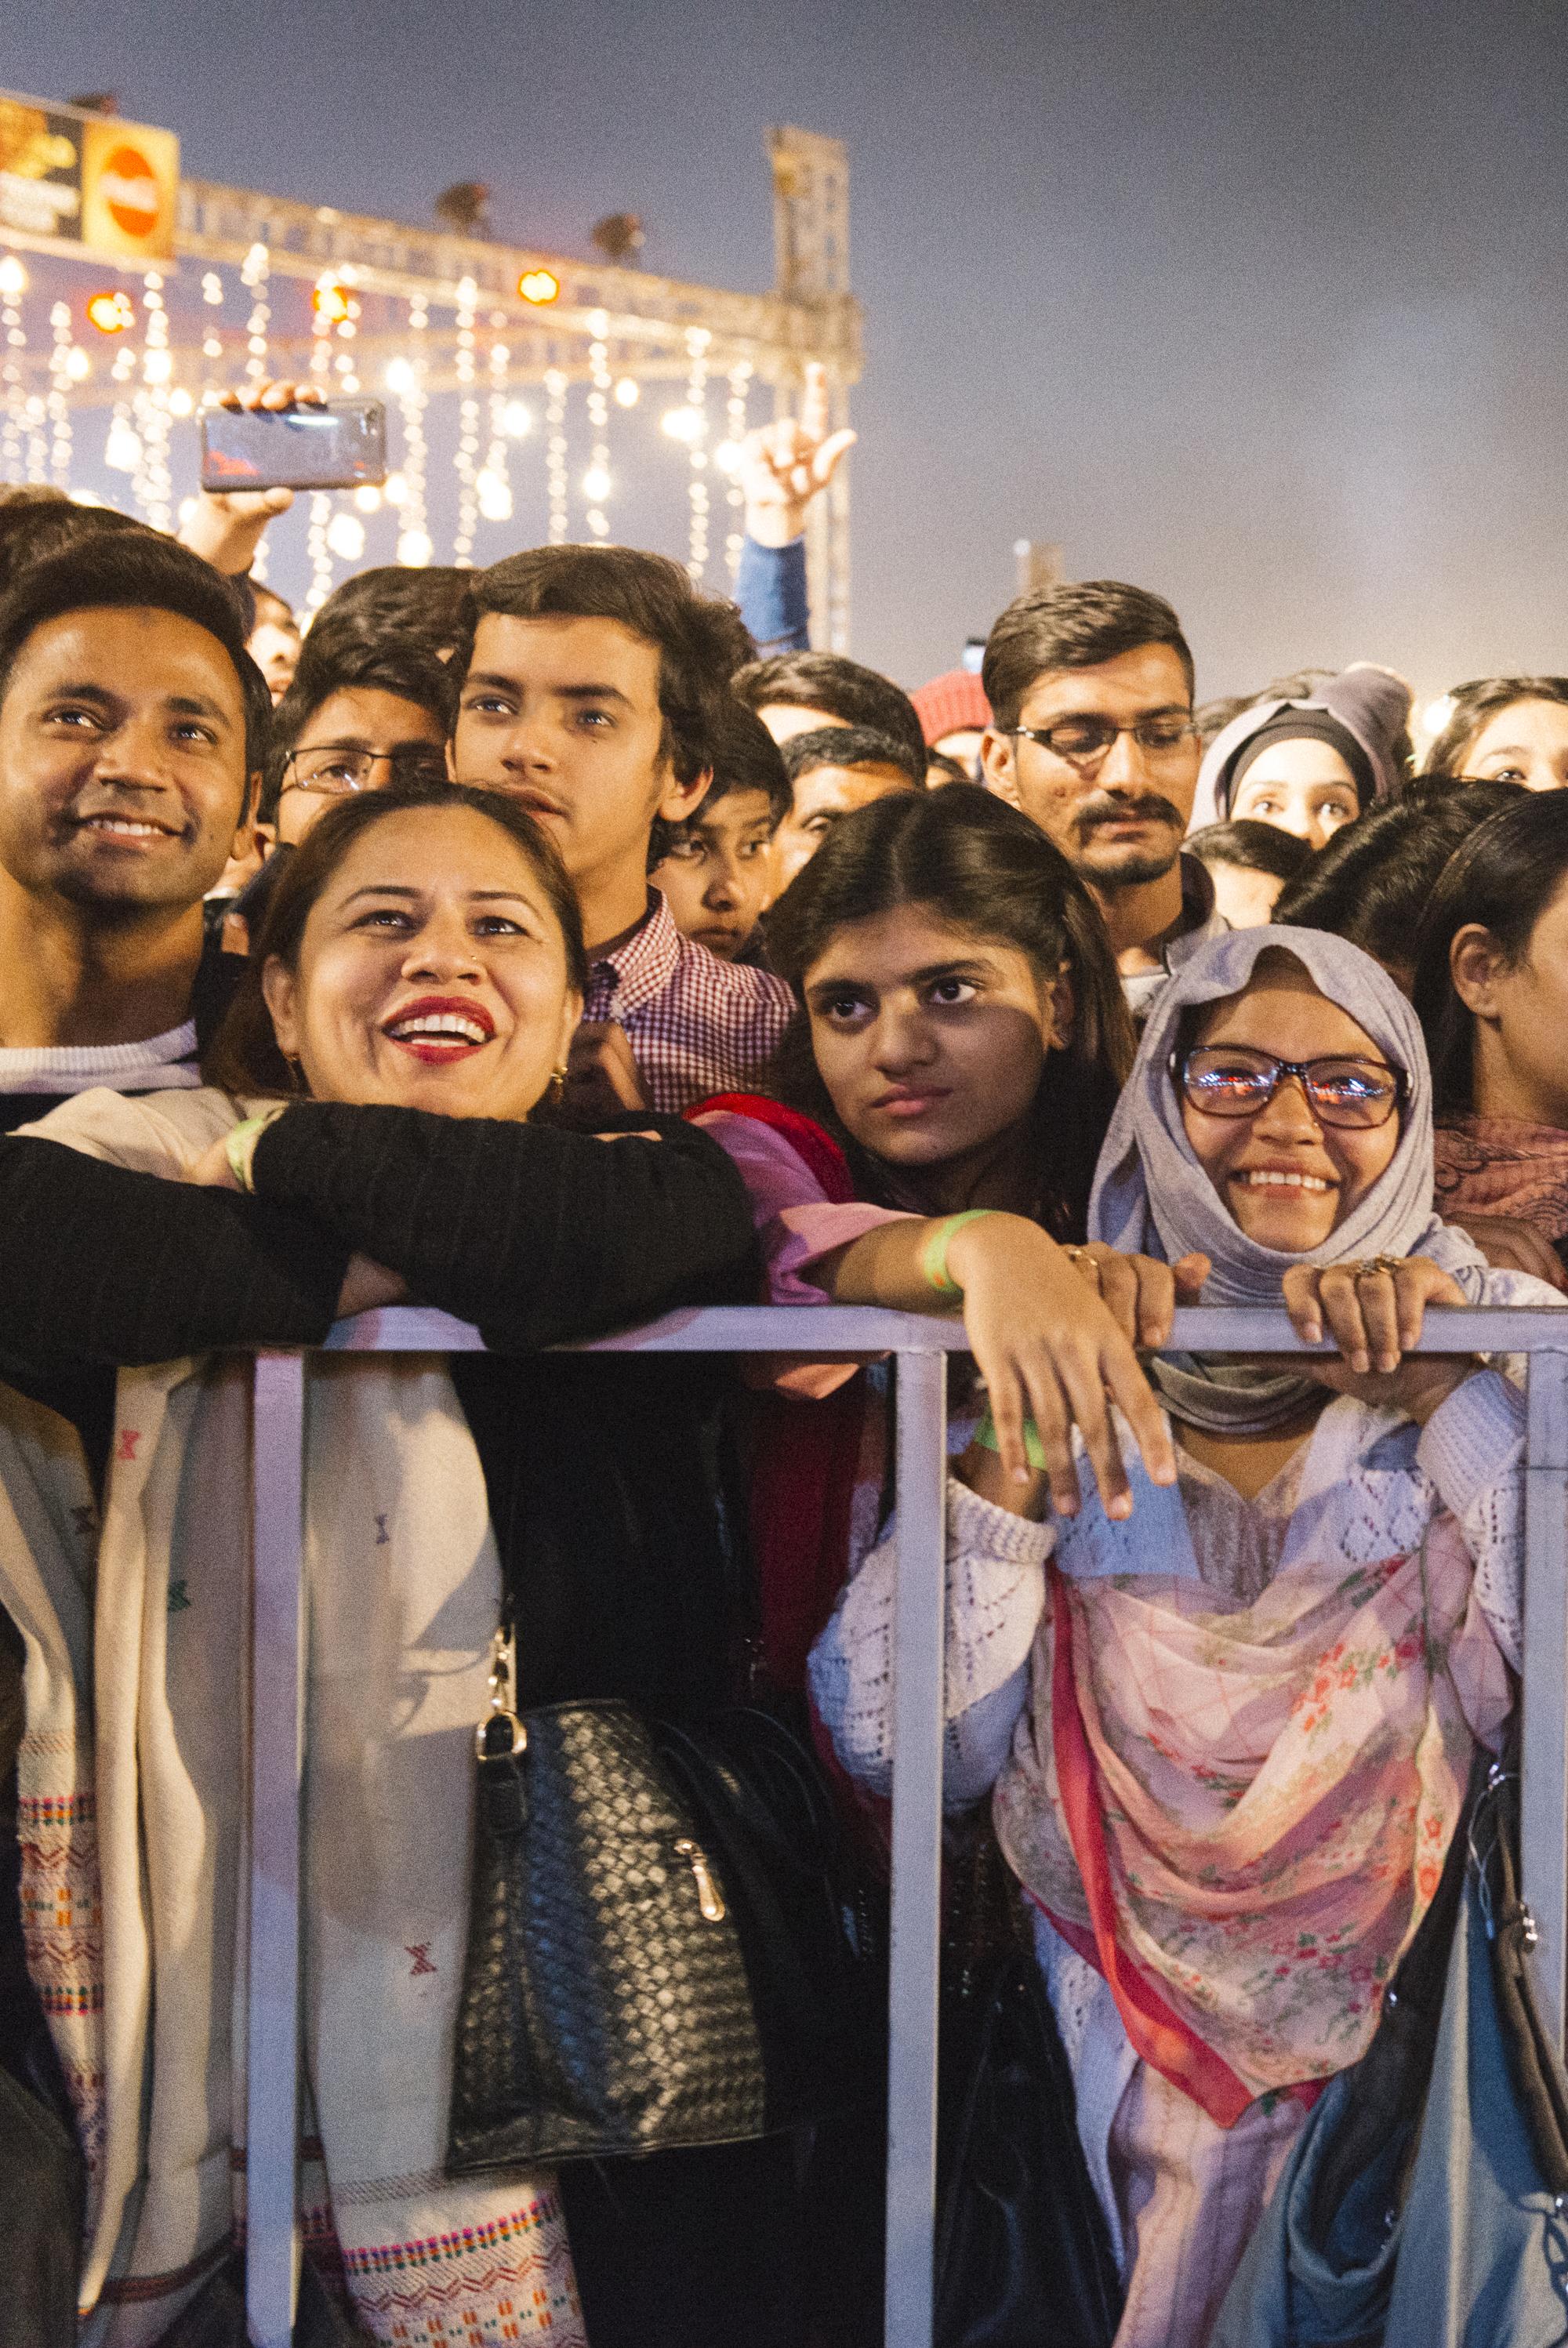 20180203_PAKISTAN_LAHORE_1177.jpg